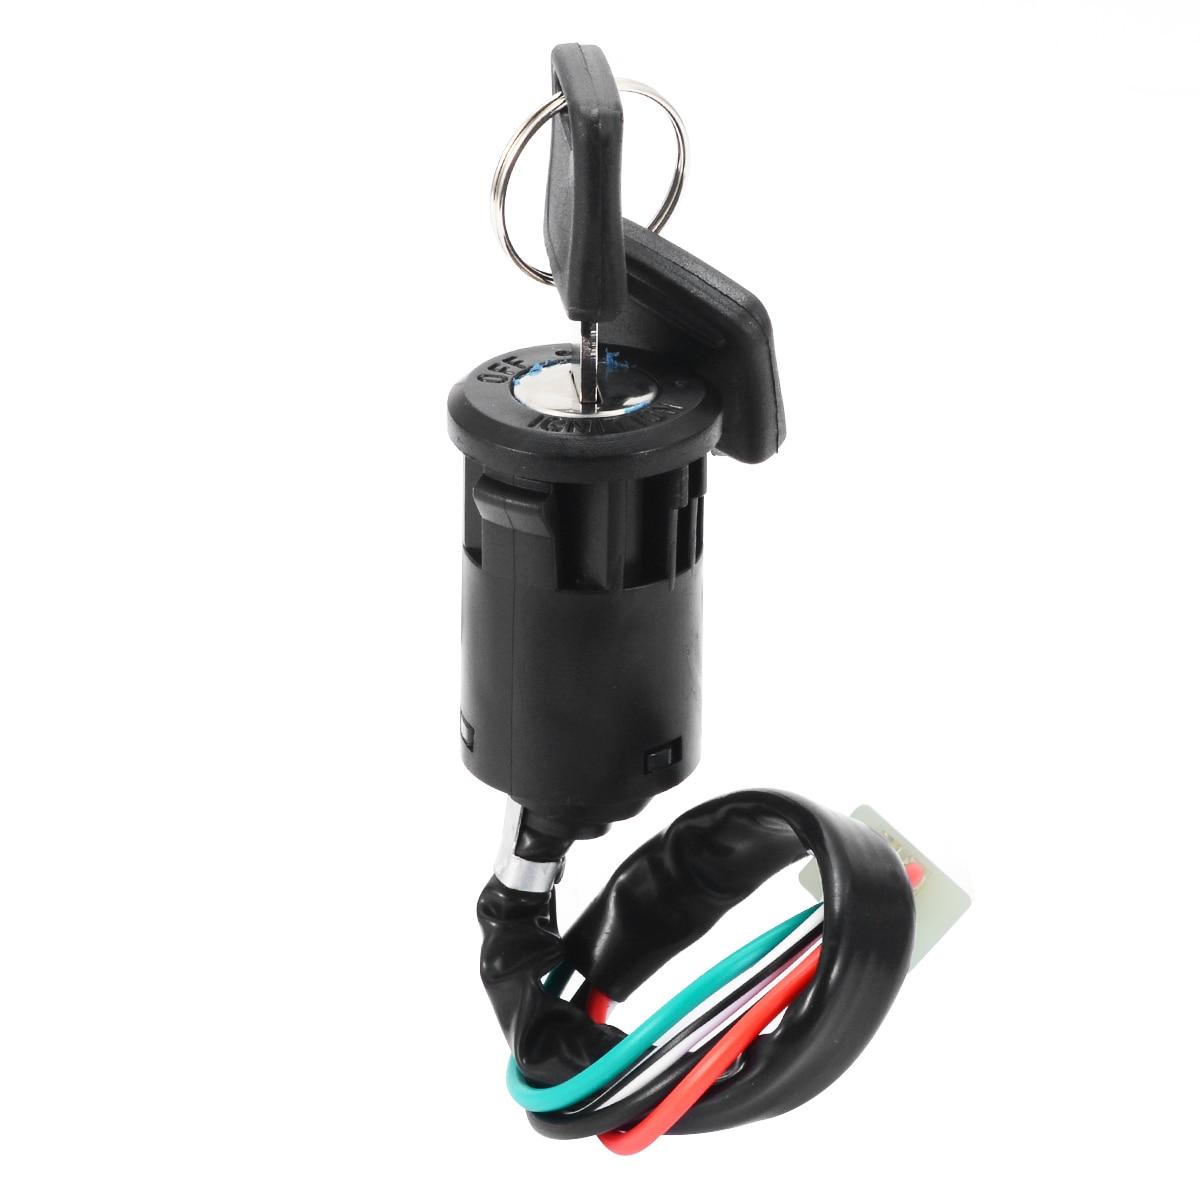 Para ATV Quad Dirt Bike 1pc 4 cables interruptor de arranque de cuatriciclos + llaves soporta 50 70 90 110 125 150 200 250CC modelo Mayitr